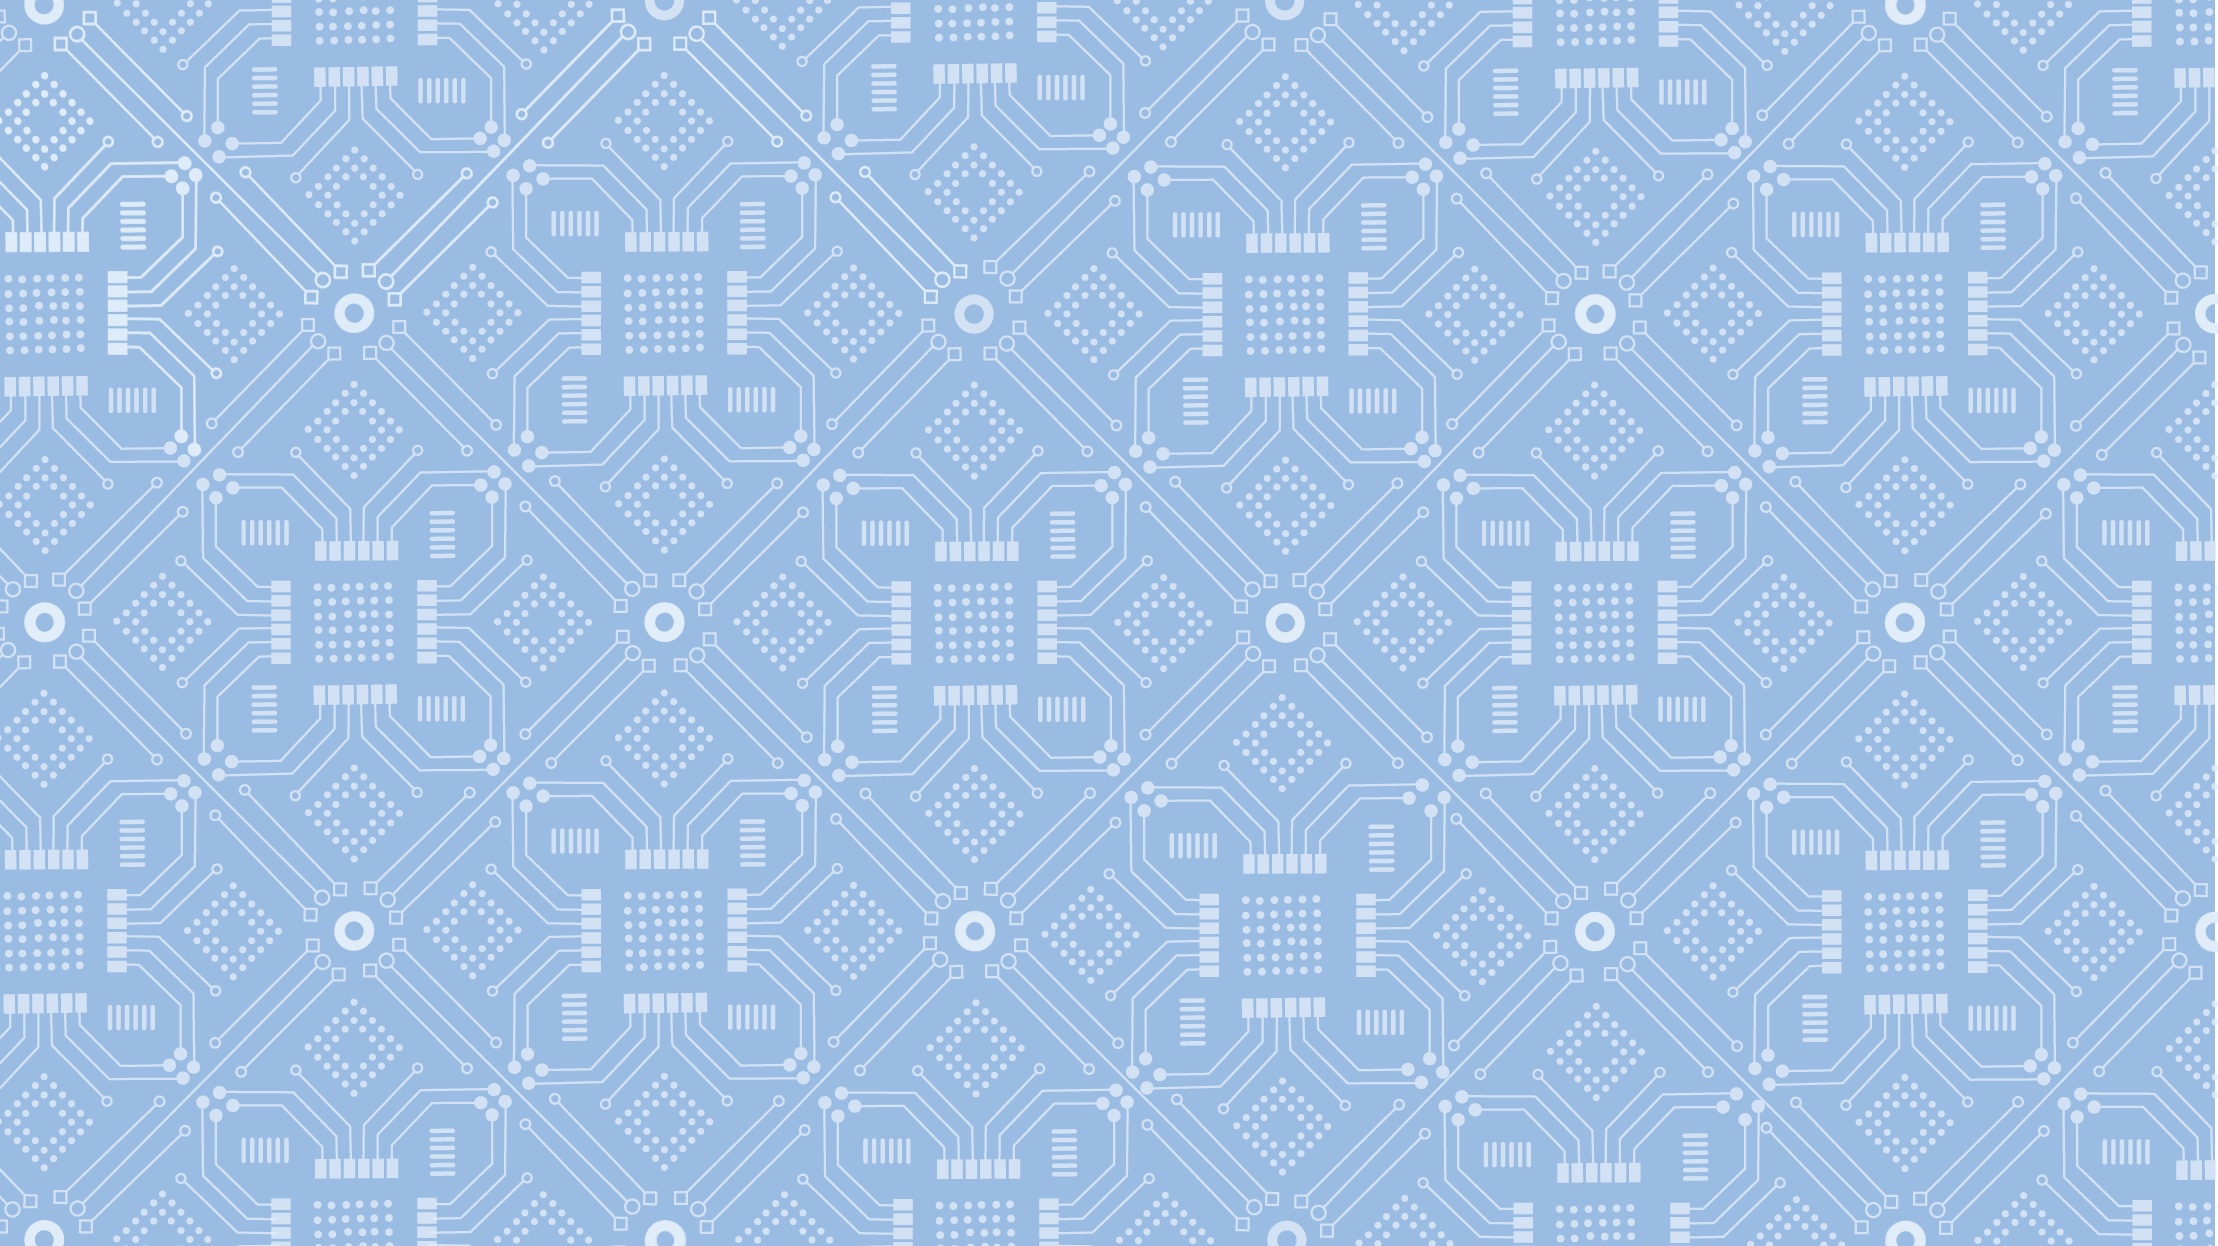 Blue-Chip-Background